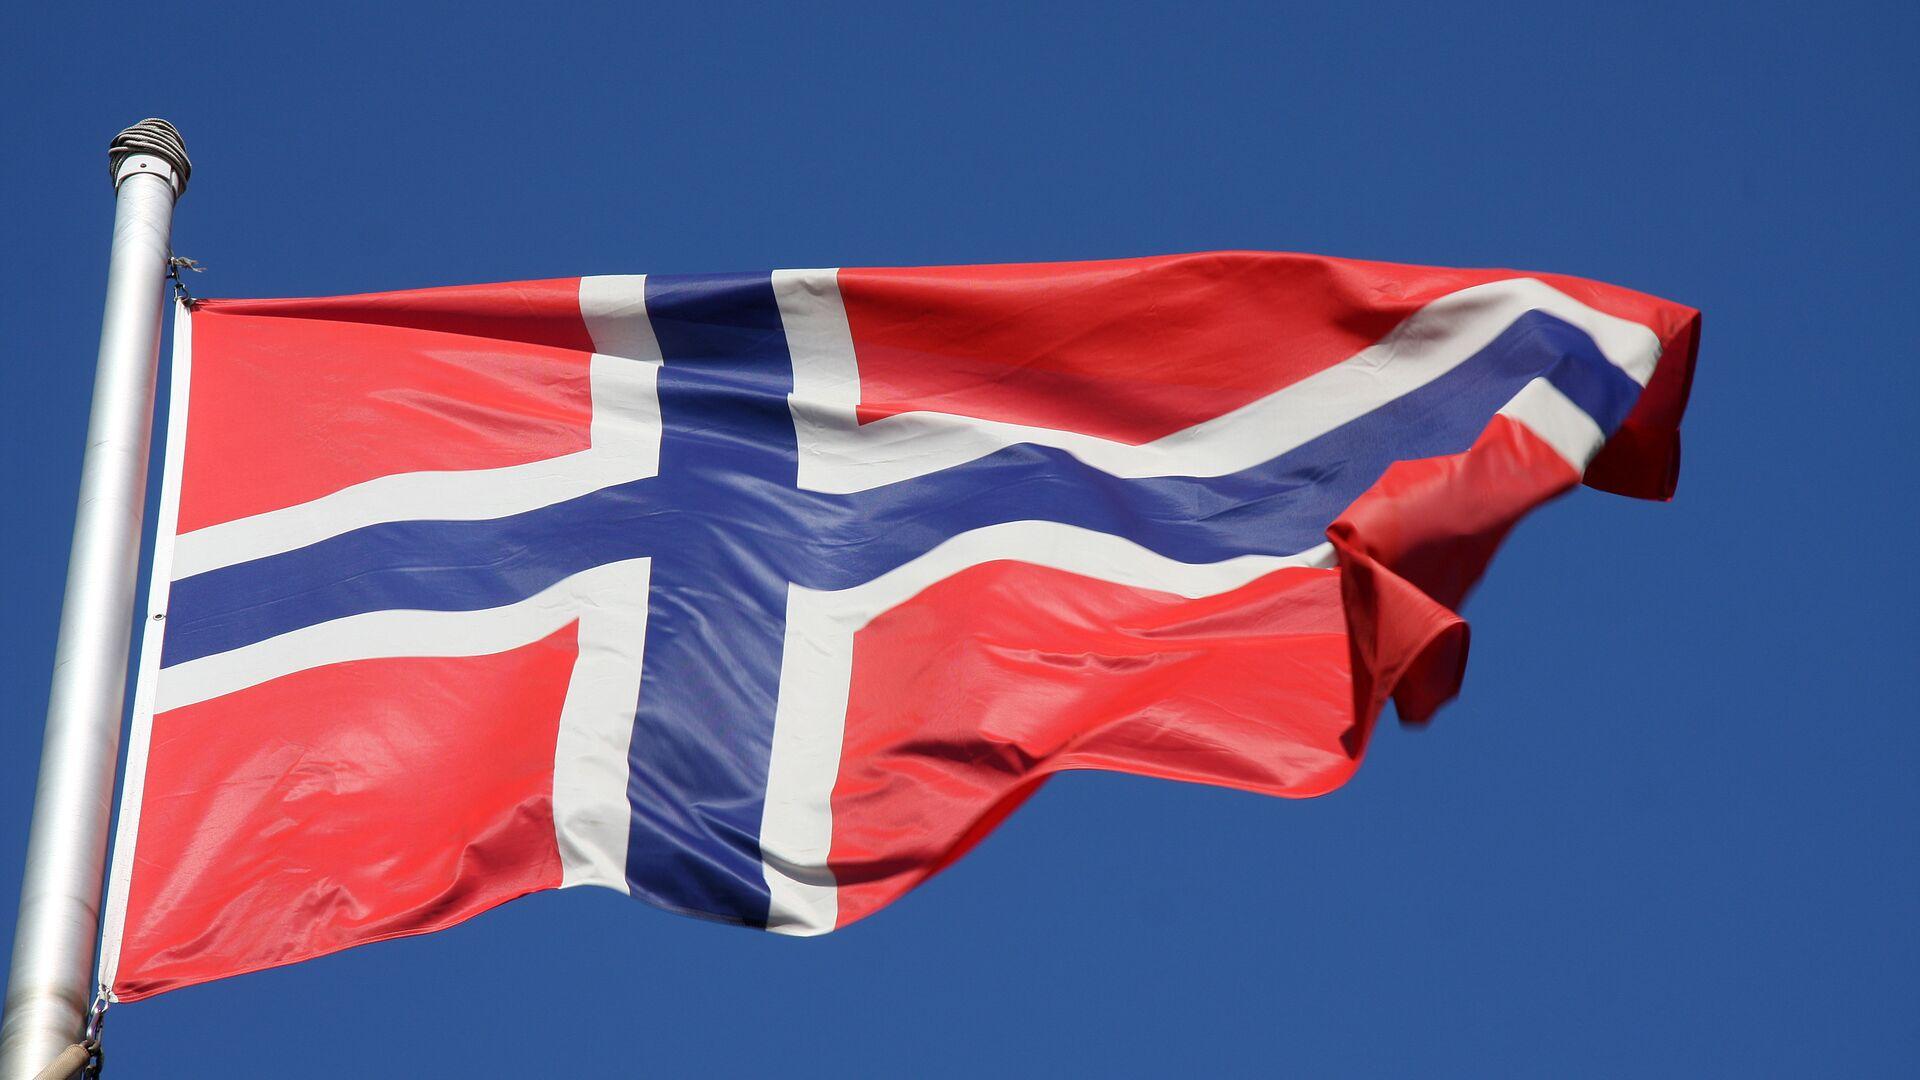 Флаг Норвегии - РИА Новости, 1920, 19.03.2021